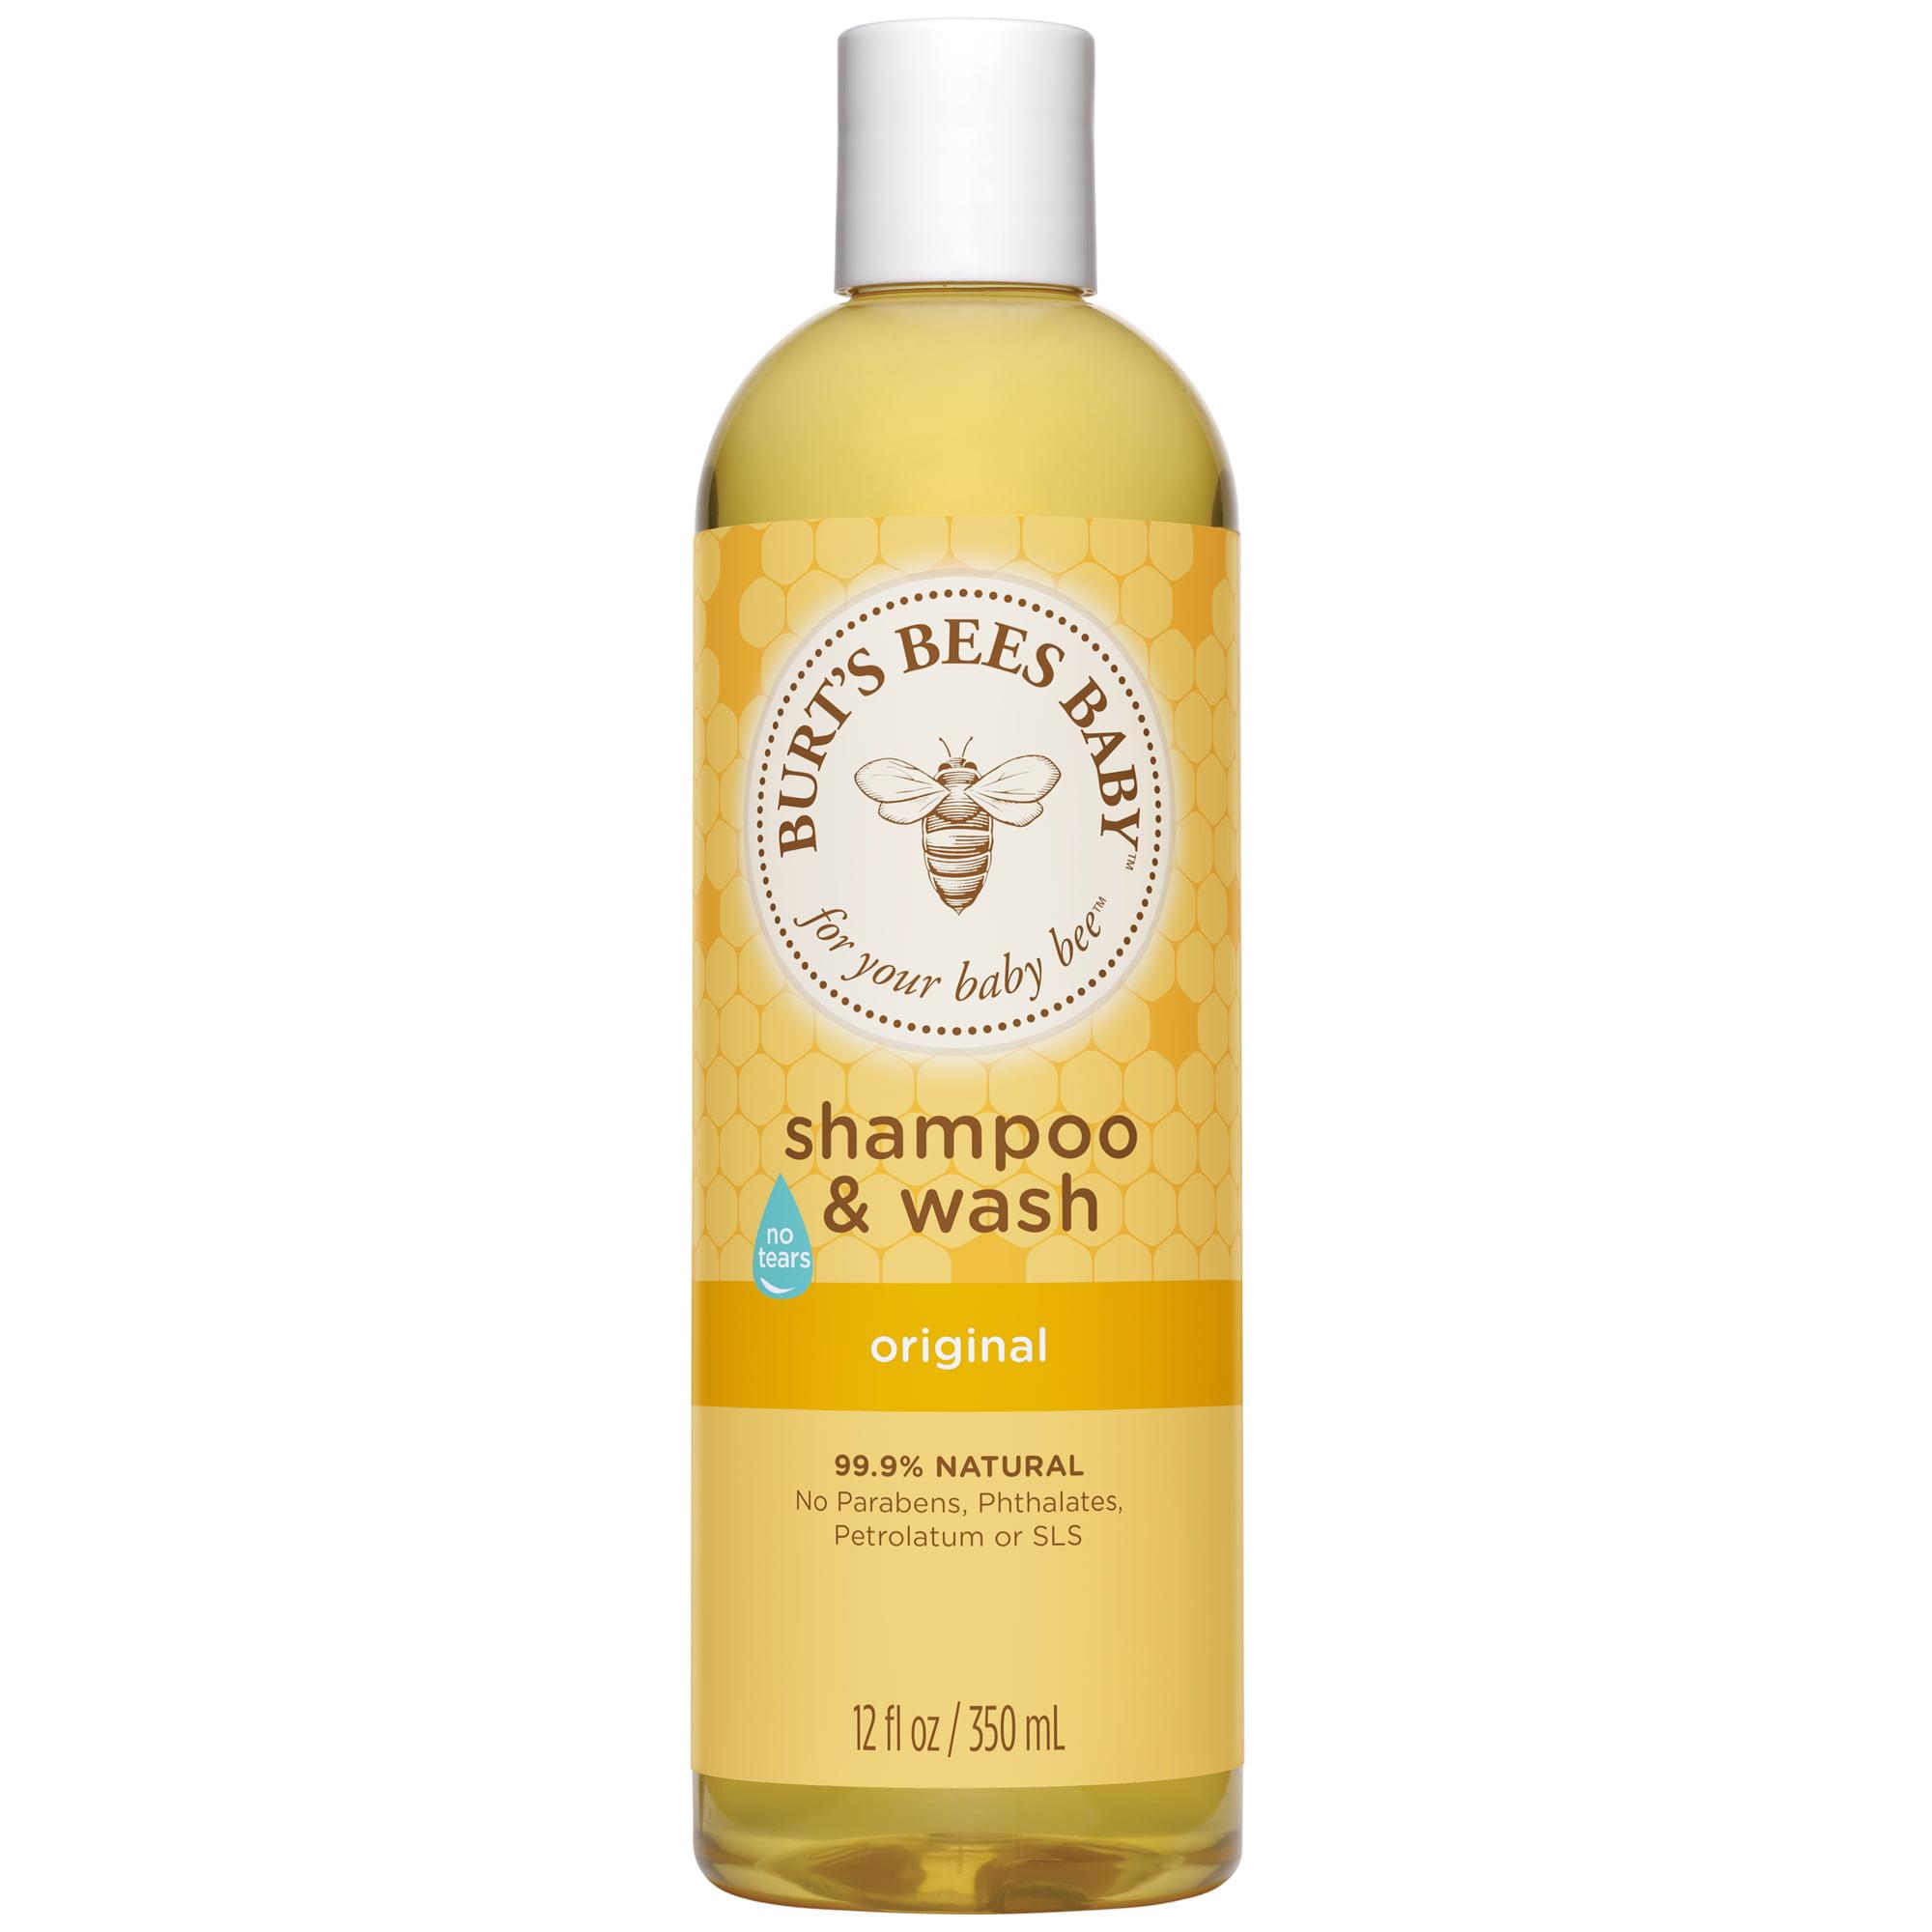 Burt's Bees Baby Shampoo & Wash, Original Tear Free Baby Soap 12 Ounce Bottle by The Clorox Company